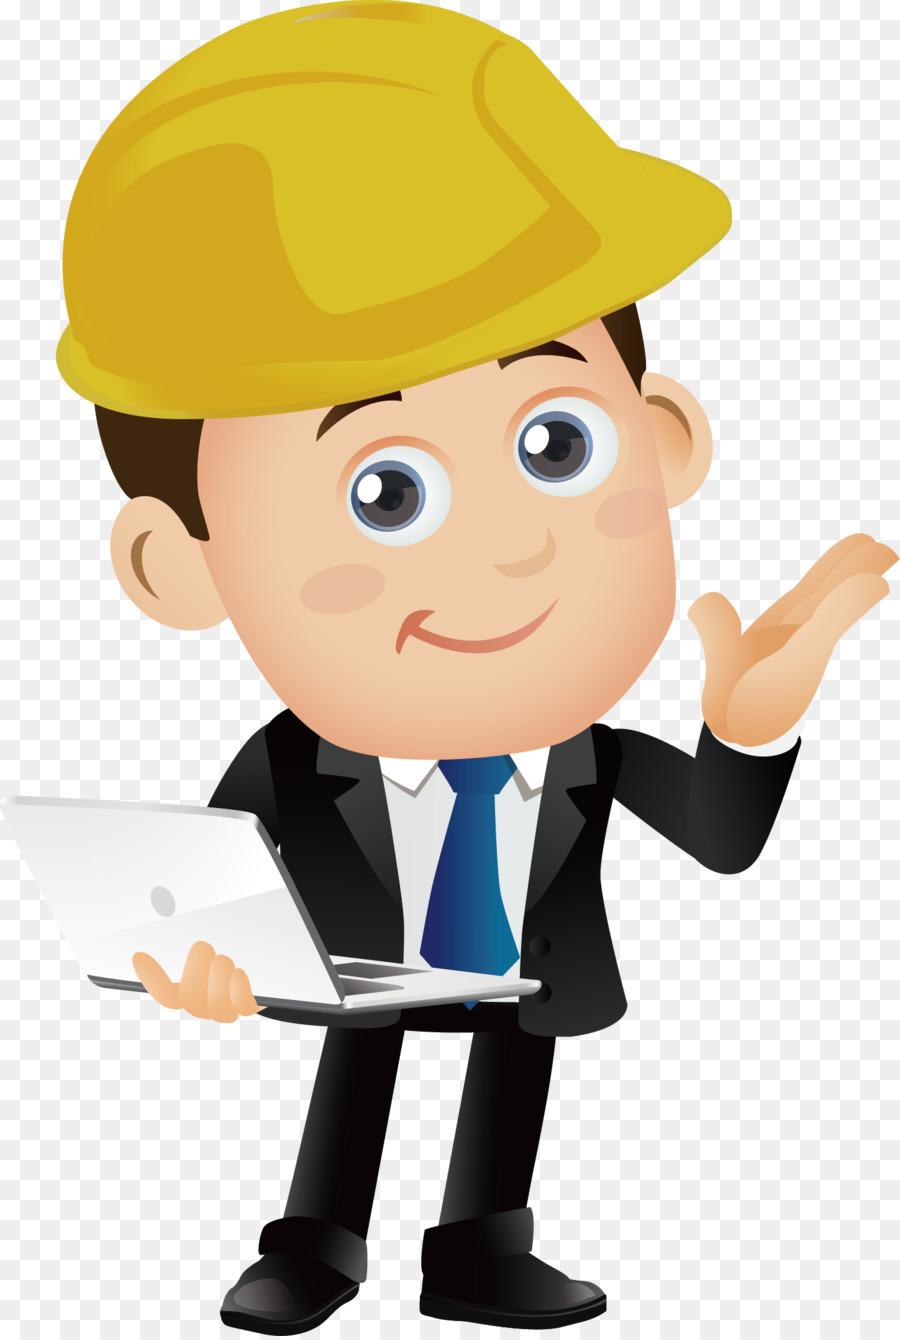 Engineering Engineer 1449 2151 Transprent Png Free